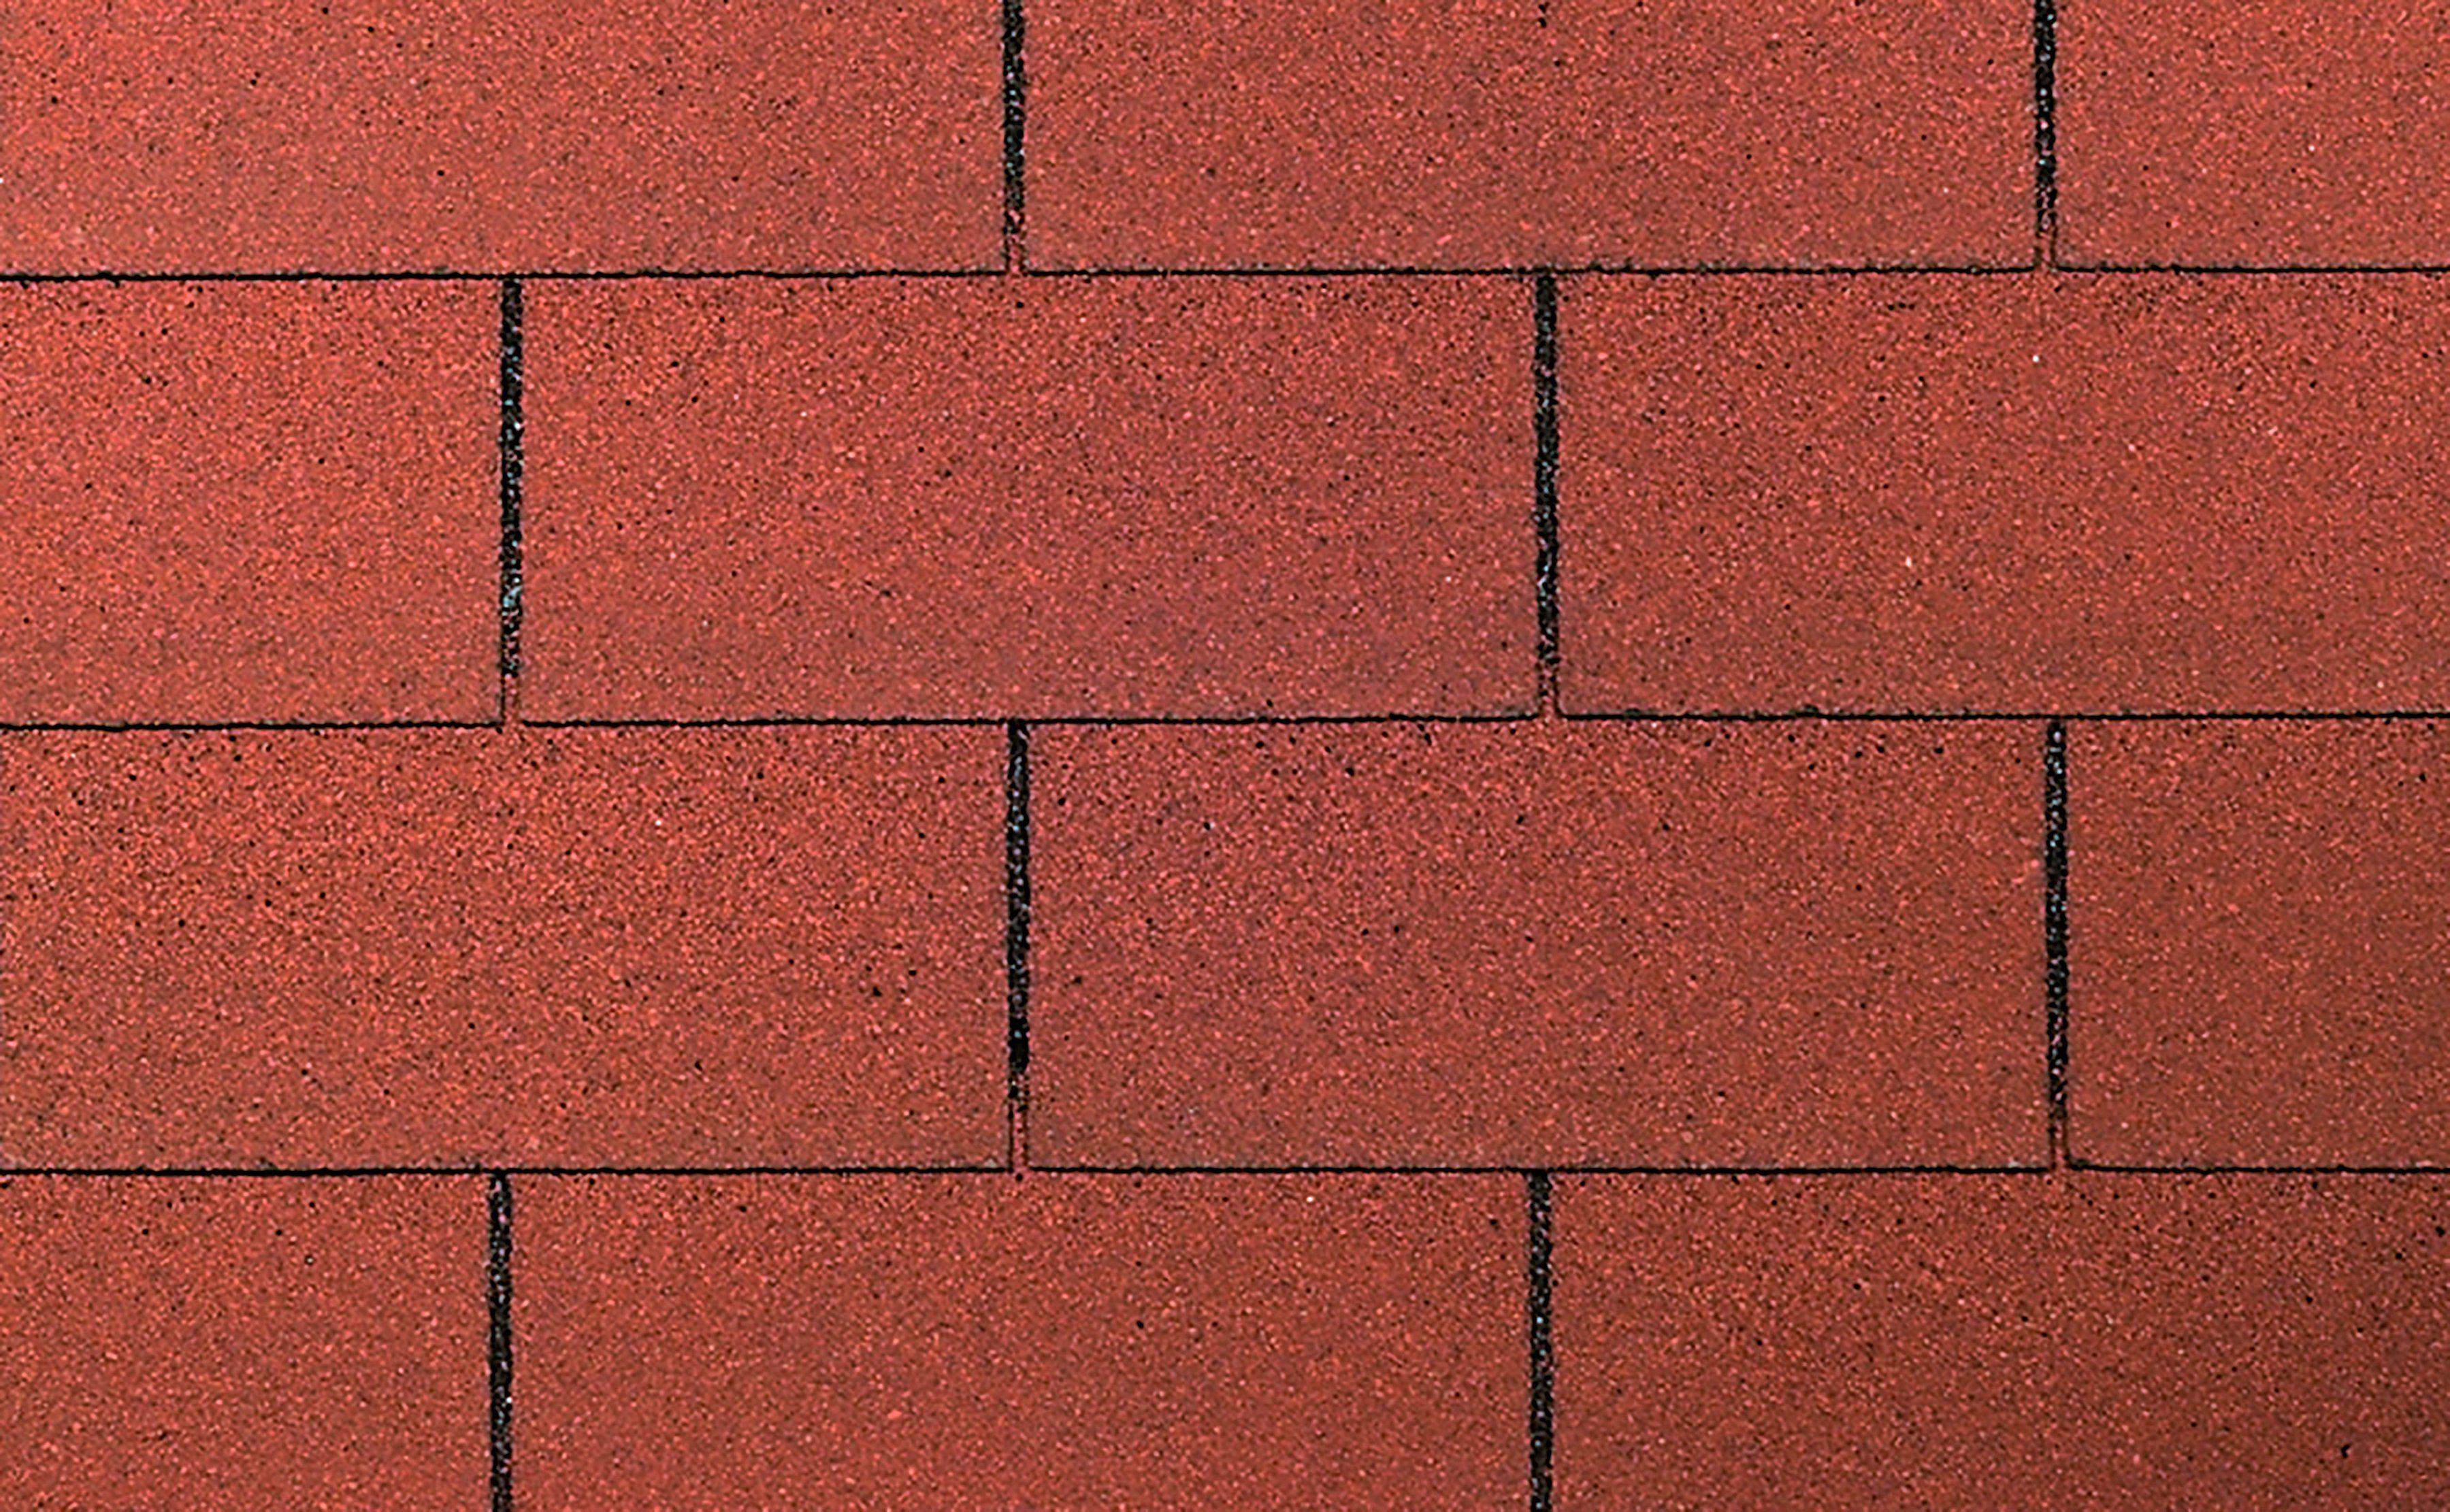 WOLFF Rechteck-Dachschindeln , 3 m², rot